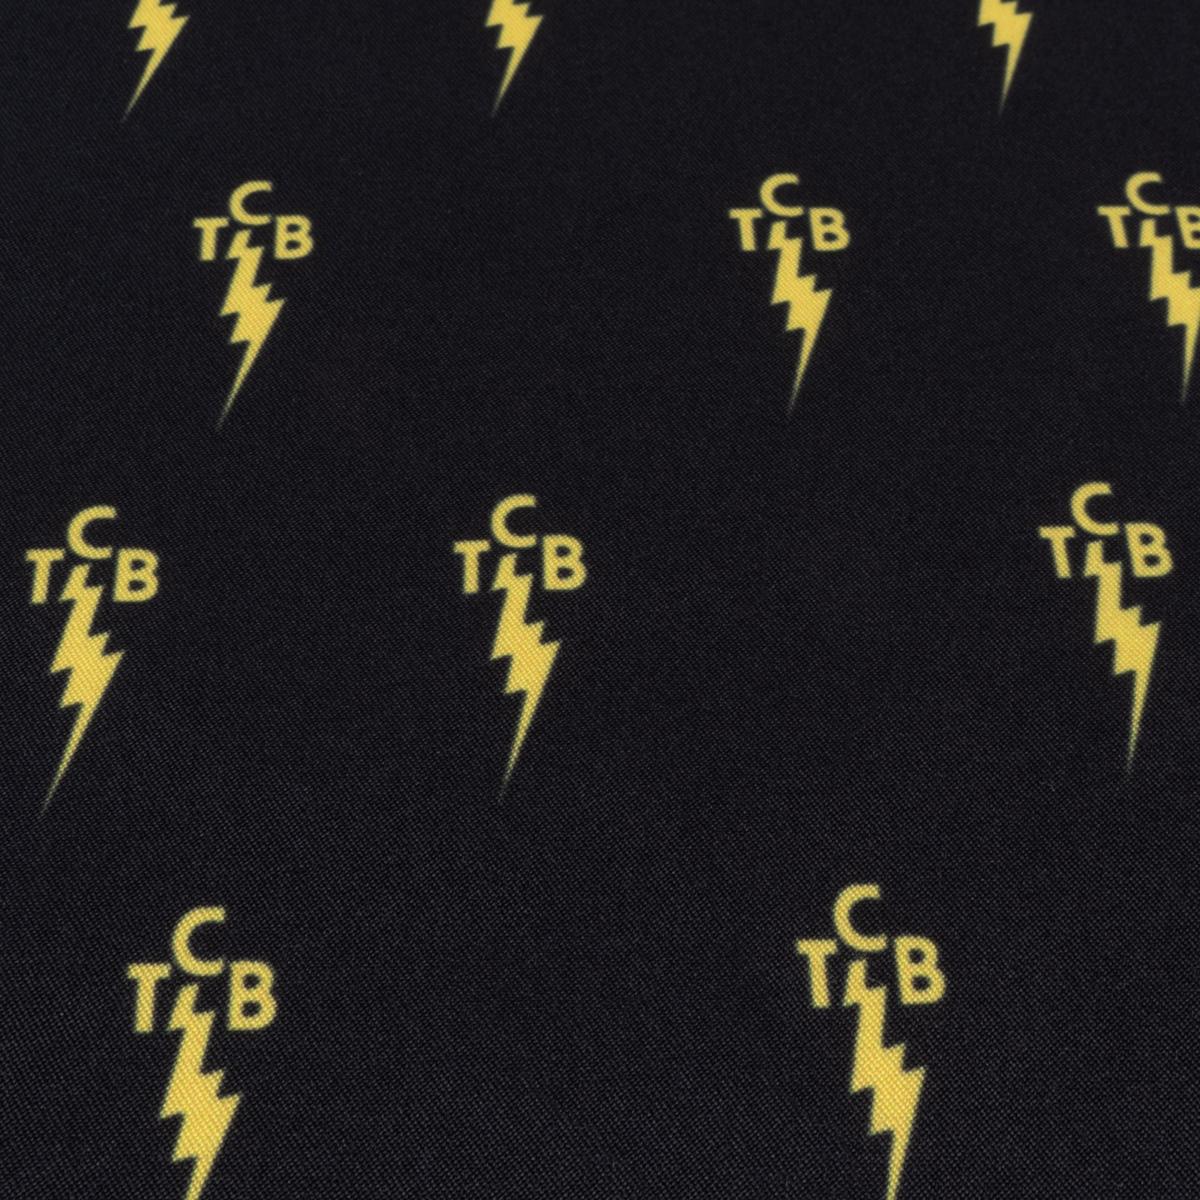 TCB Board Shorts - Black and Yellow